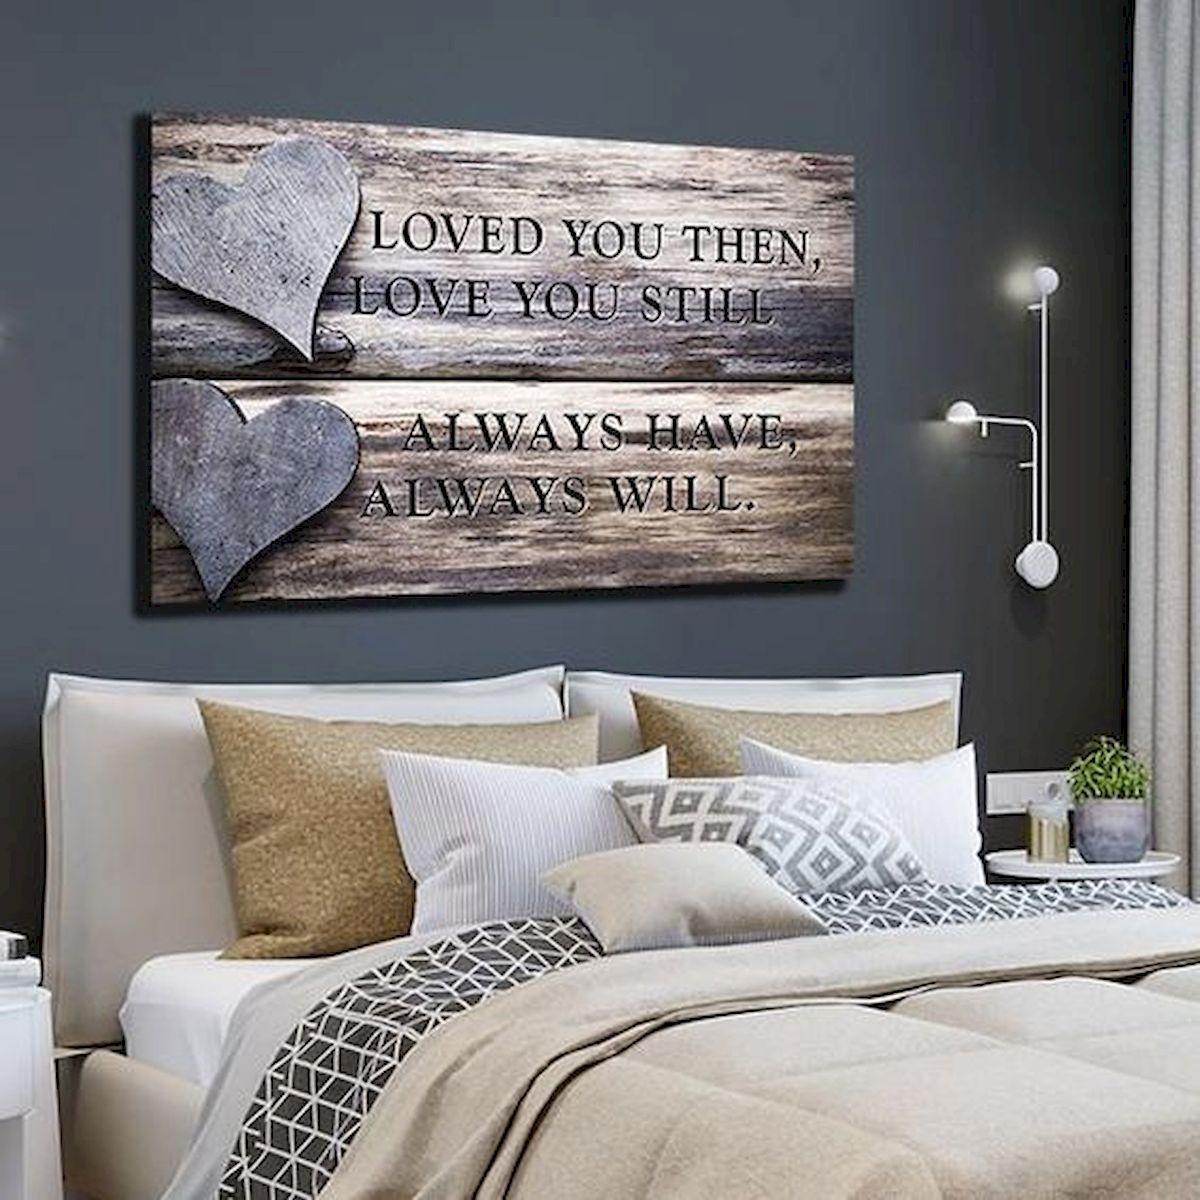 55 Romantic DIY Bedroom Decor for Couple (24)